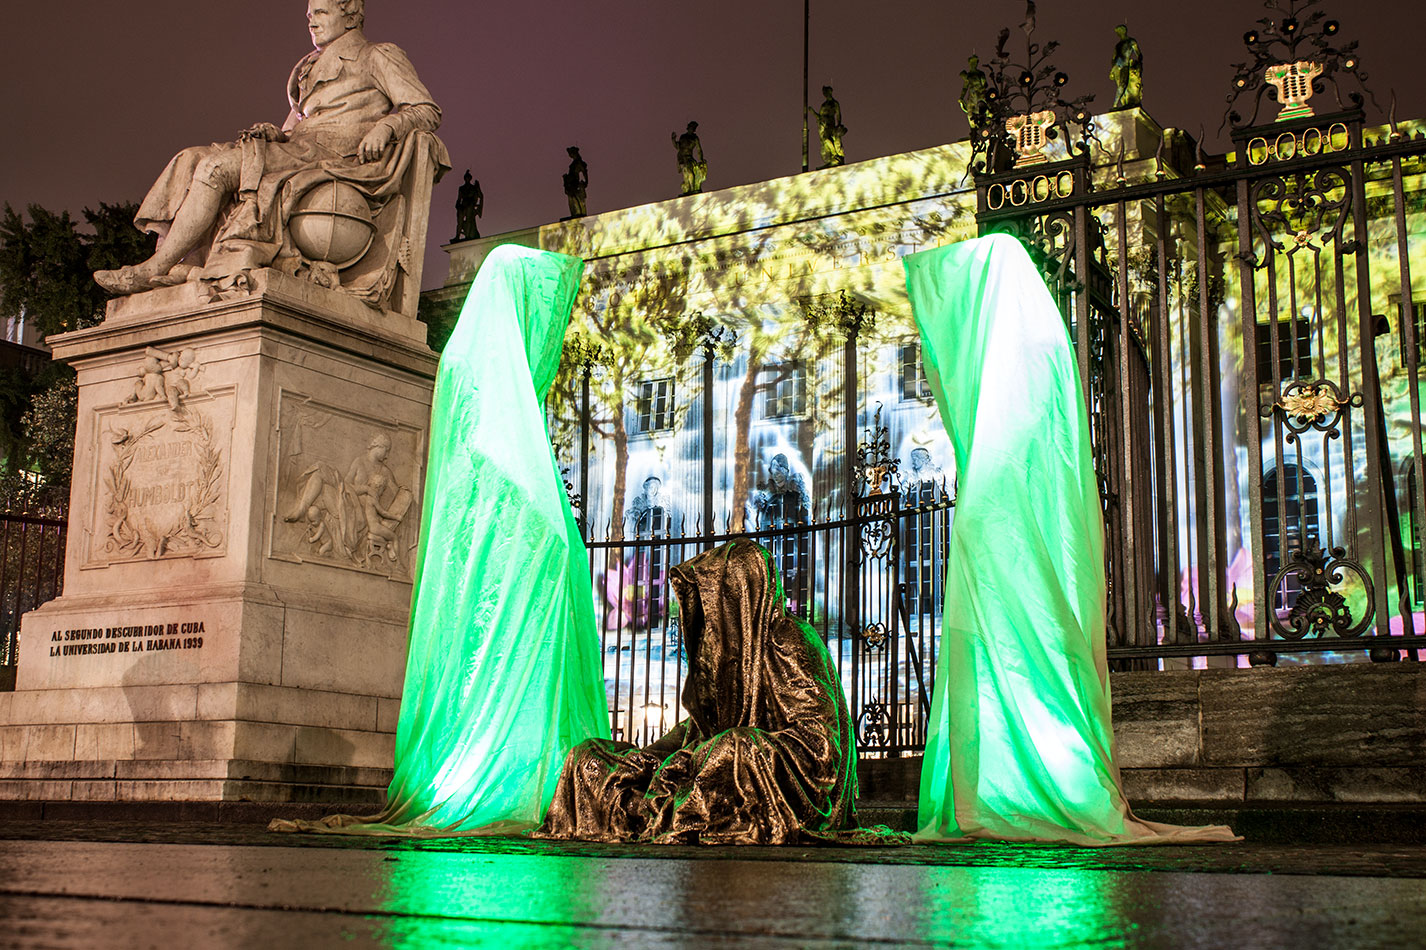 festival-of-lights-berlin-humbold-university-light-art-festival-contemporary-fine-art-design-show-guardiansof-time-manfred-kili-kielnhofer-sculpture-3609